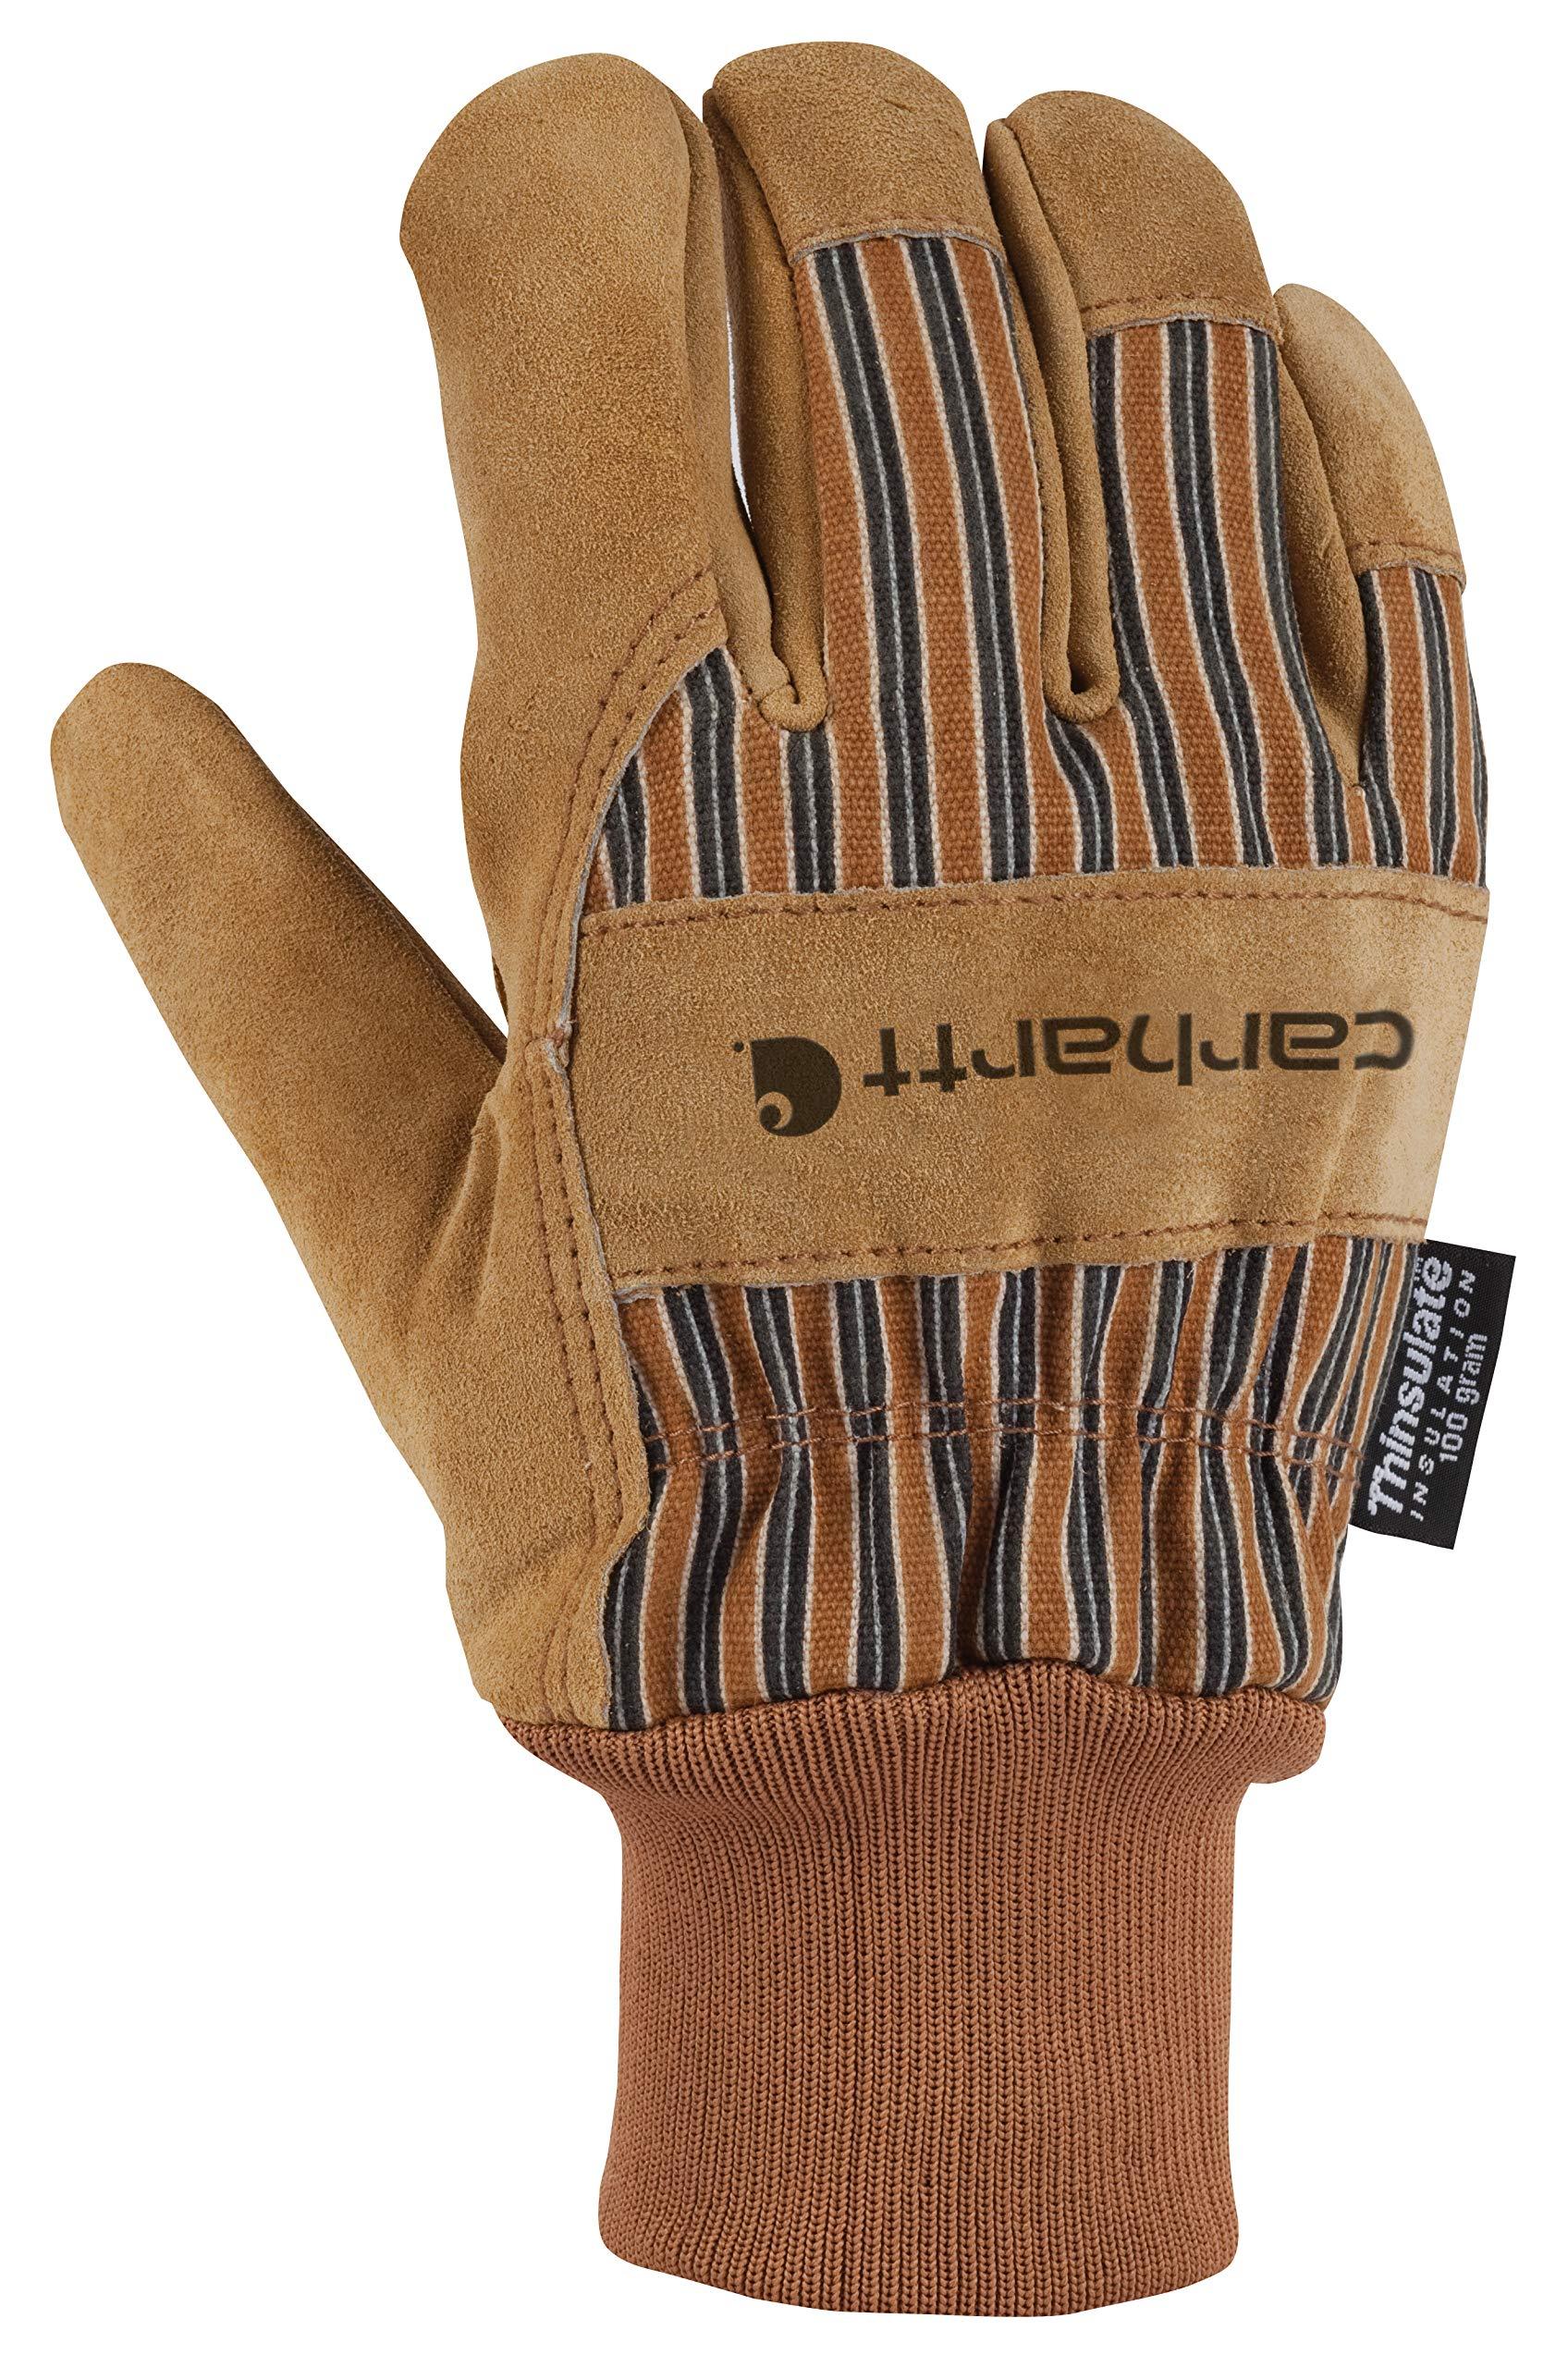 Carhartt Insulated Suede Glove Medium